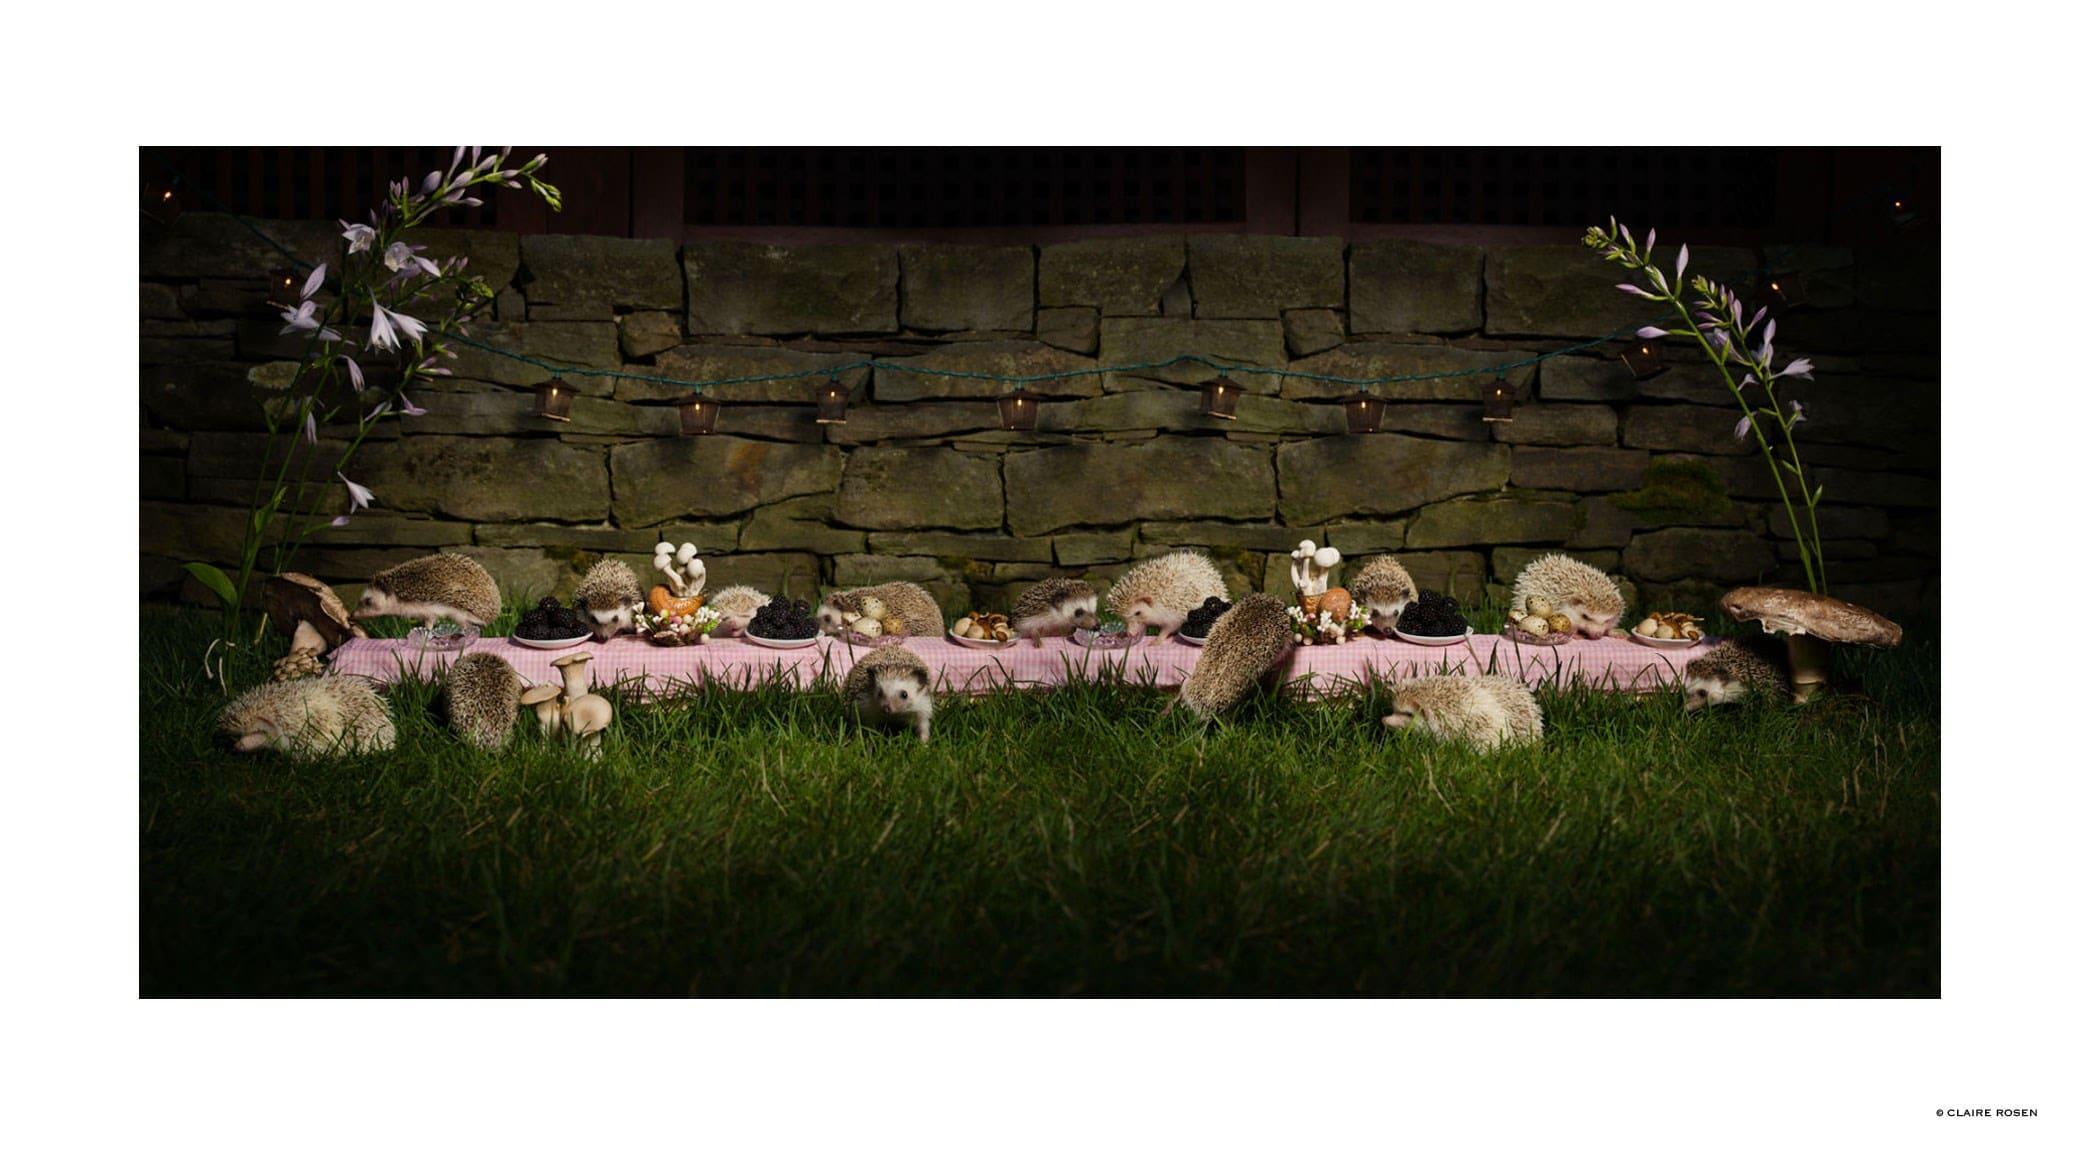 original_hedgehog-claire-rosen-finedininglovers.jpg